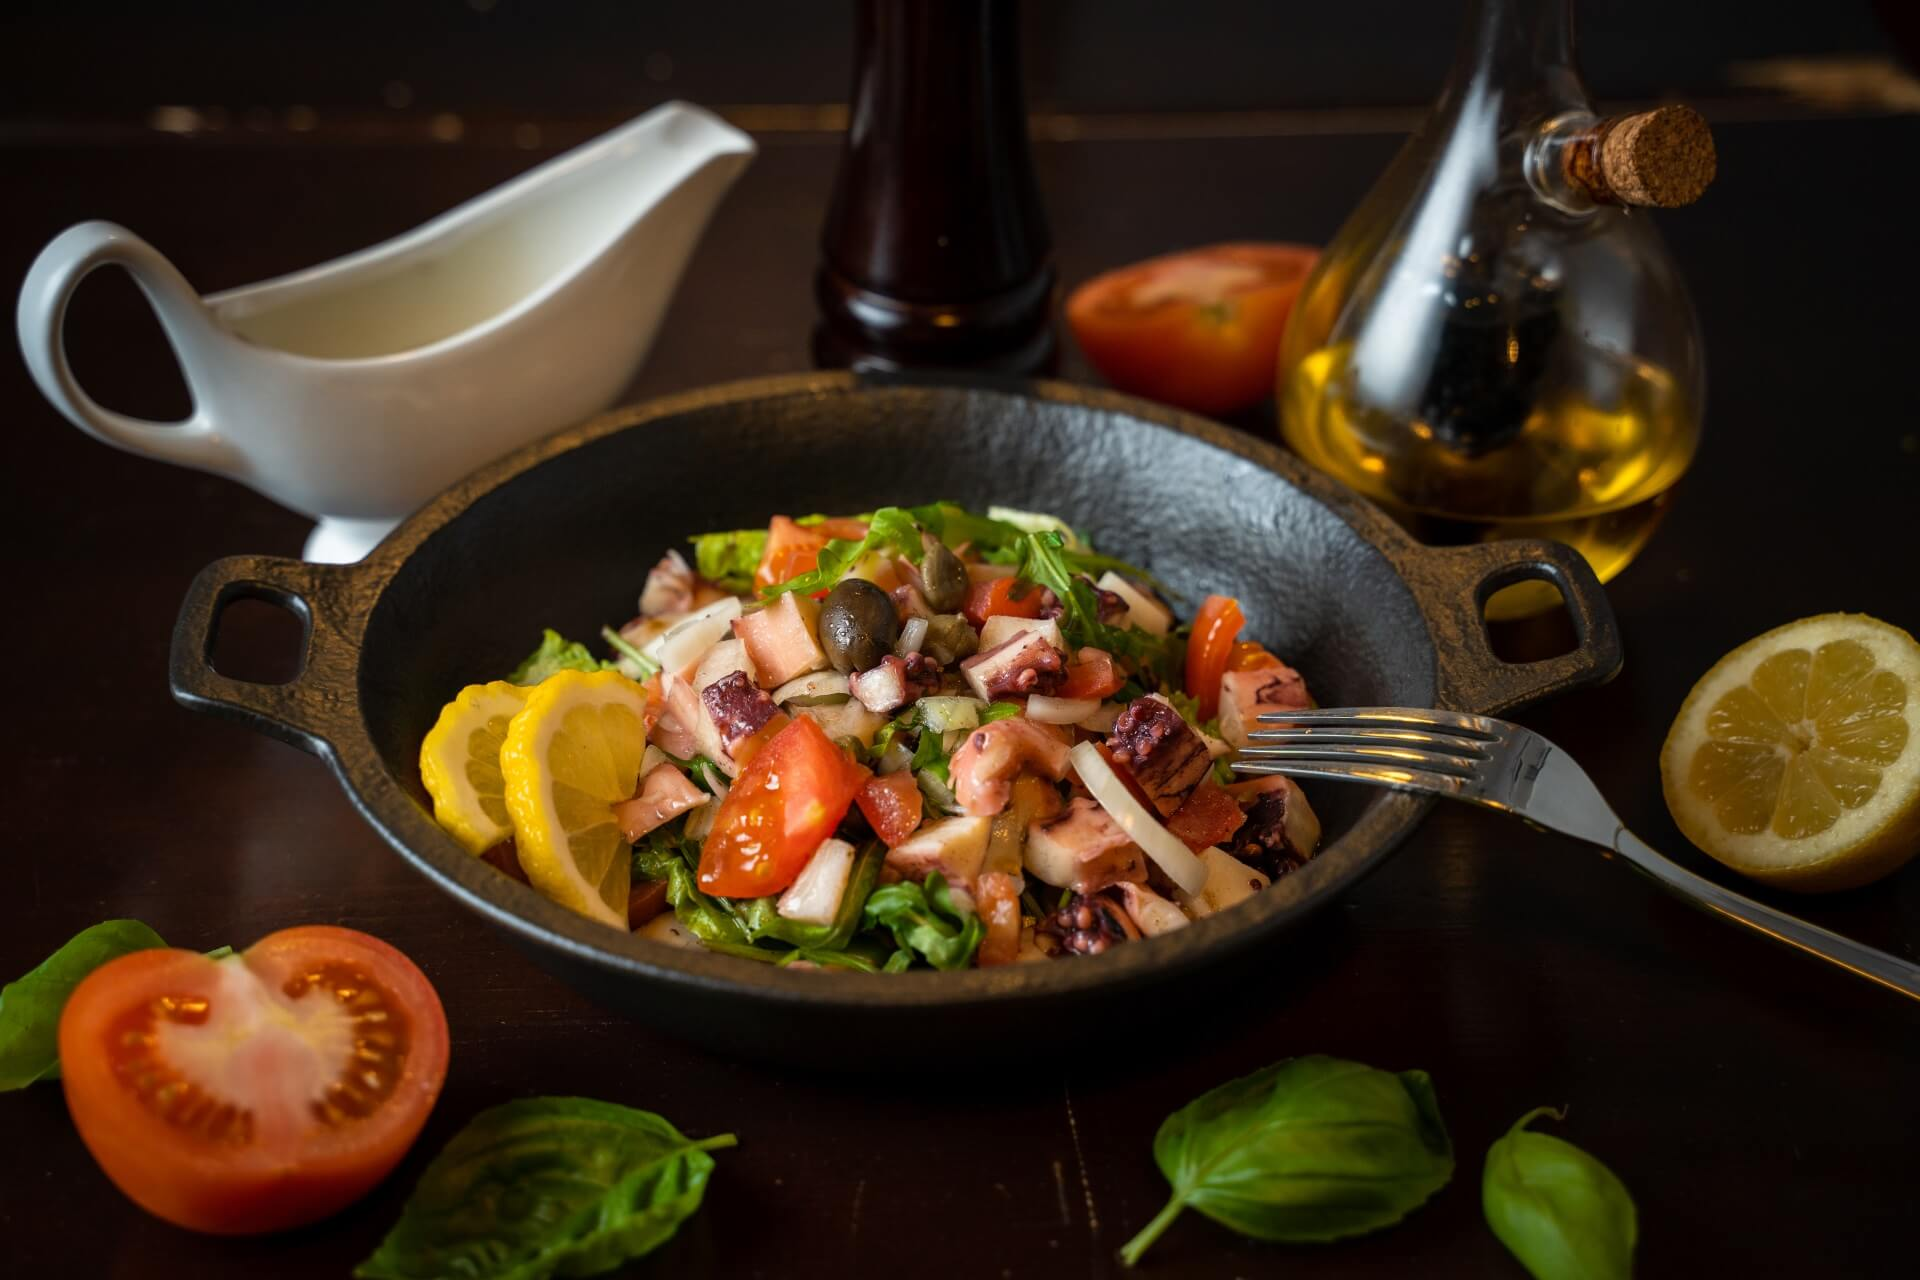 portun dubrovnik restaurant salad